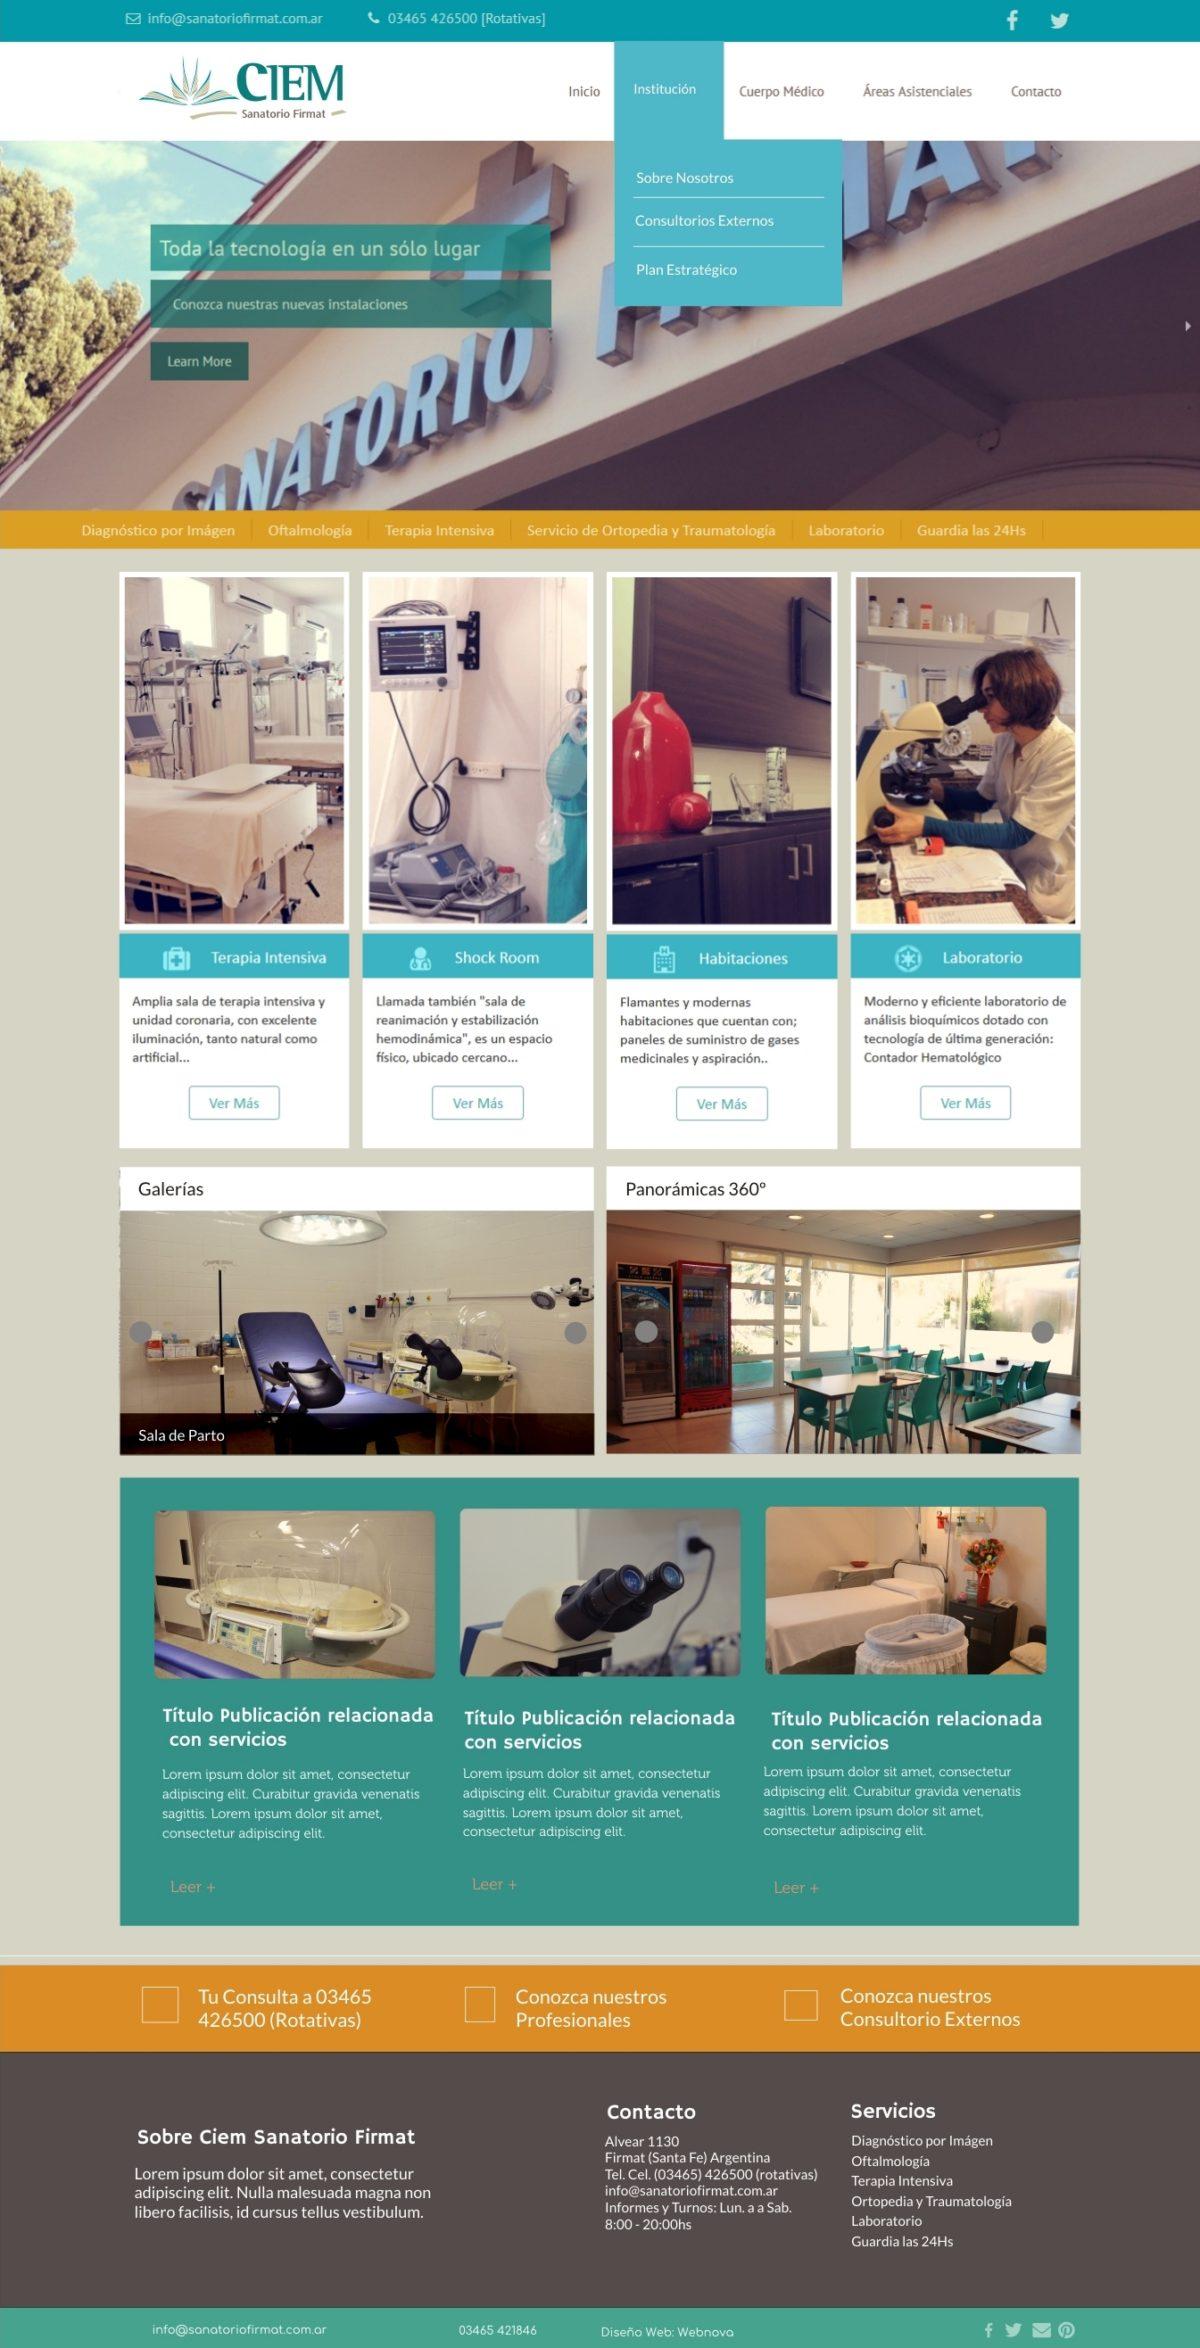 Diseño Web a Medida «CIEM Sanatorio Firmat»